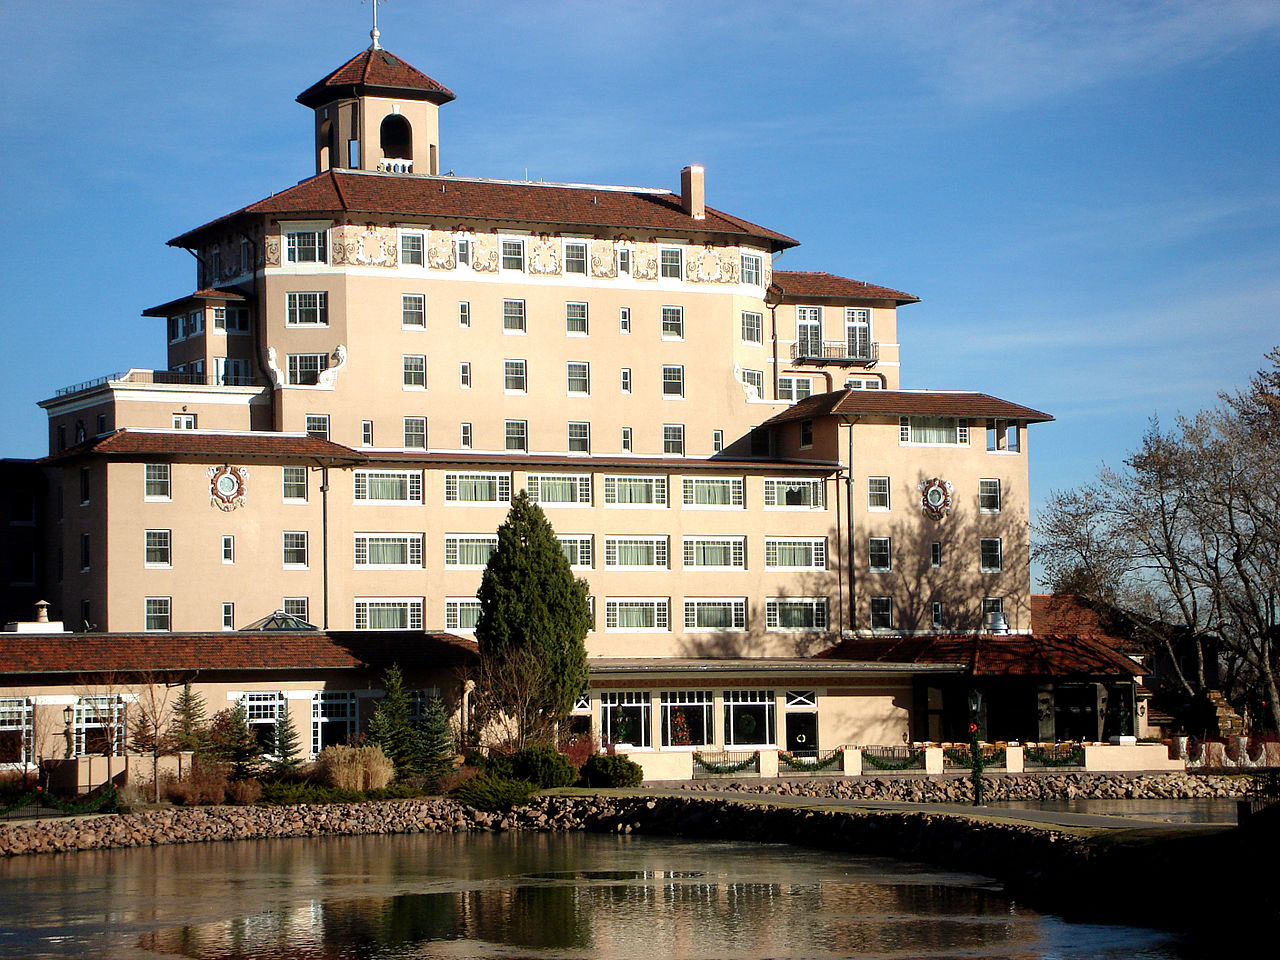 1280px-Broadmoor_Hotel,_Dec_2007.jpeg